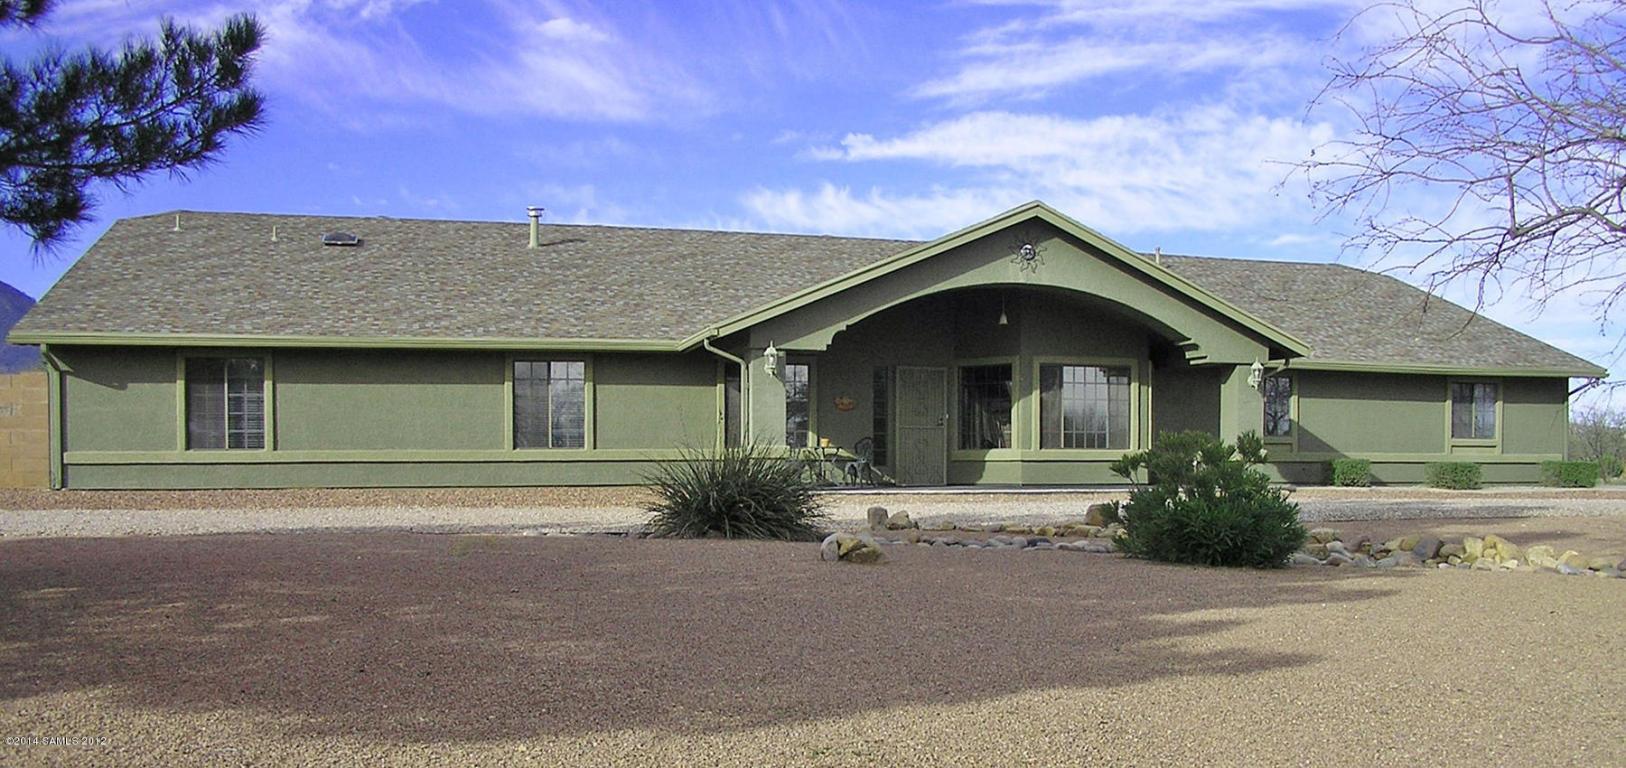 2 acres by Sierra Vista, Arizona for sale